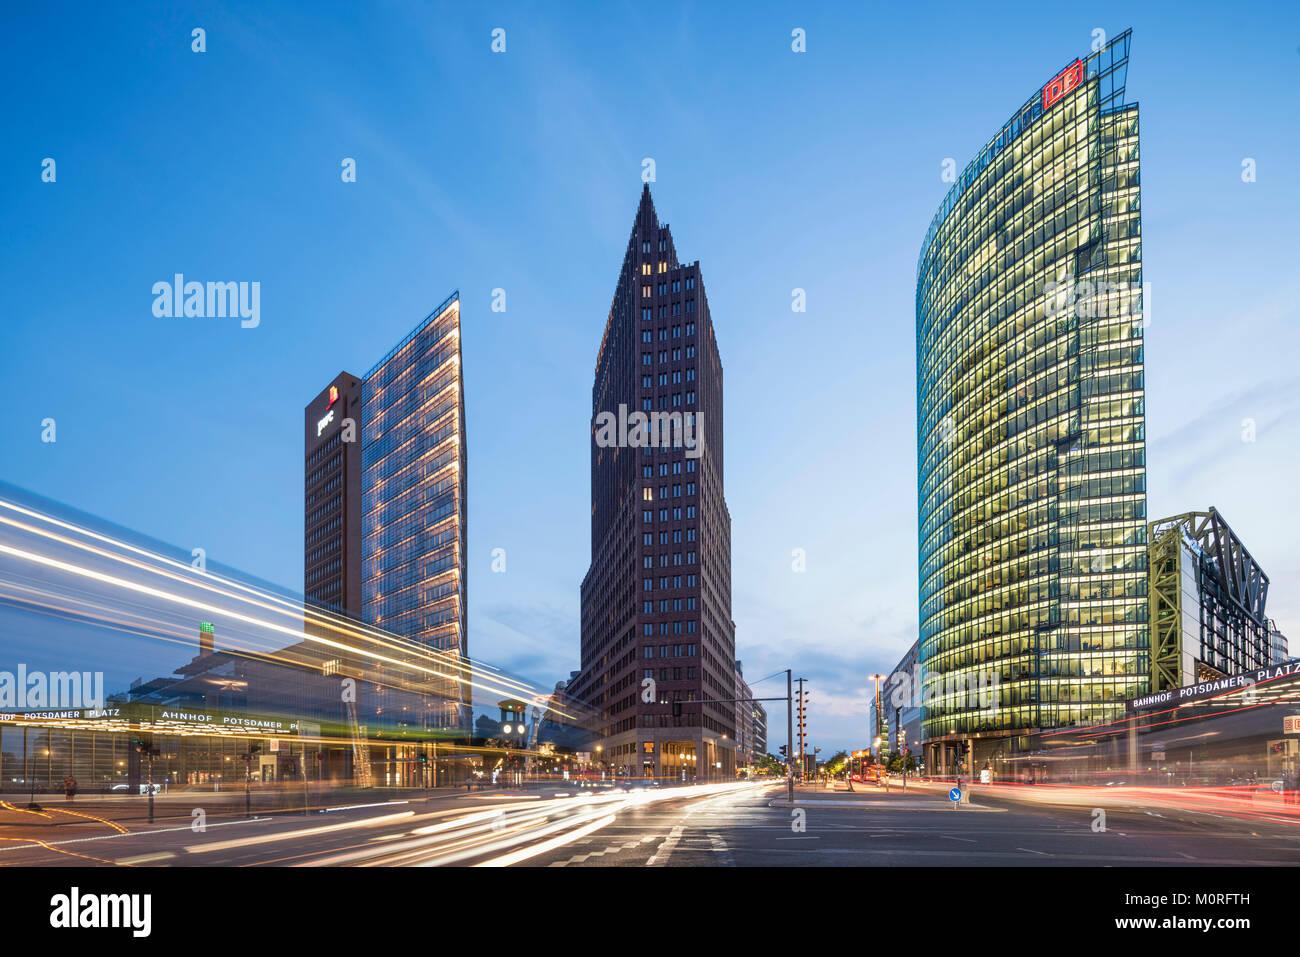 Potsdamer Platz, Berlin, Kollhoff-Tower, Sony Center, DB-Tower, Beisheim Center, S-Bahn-Eingang, Berlin Mitte, Deutschland Stockbild